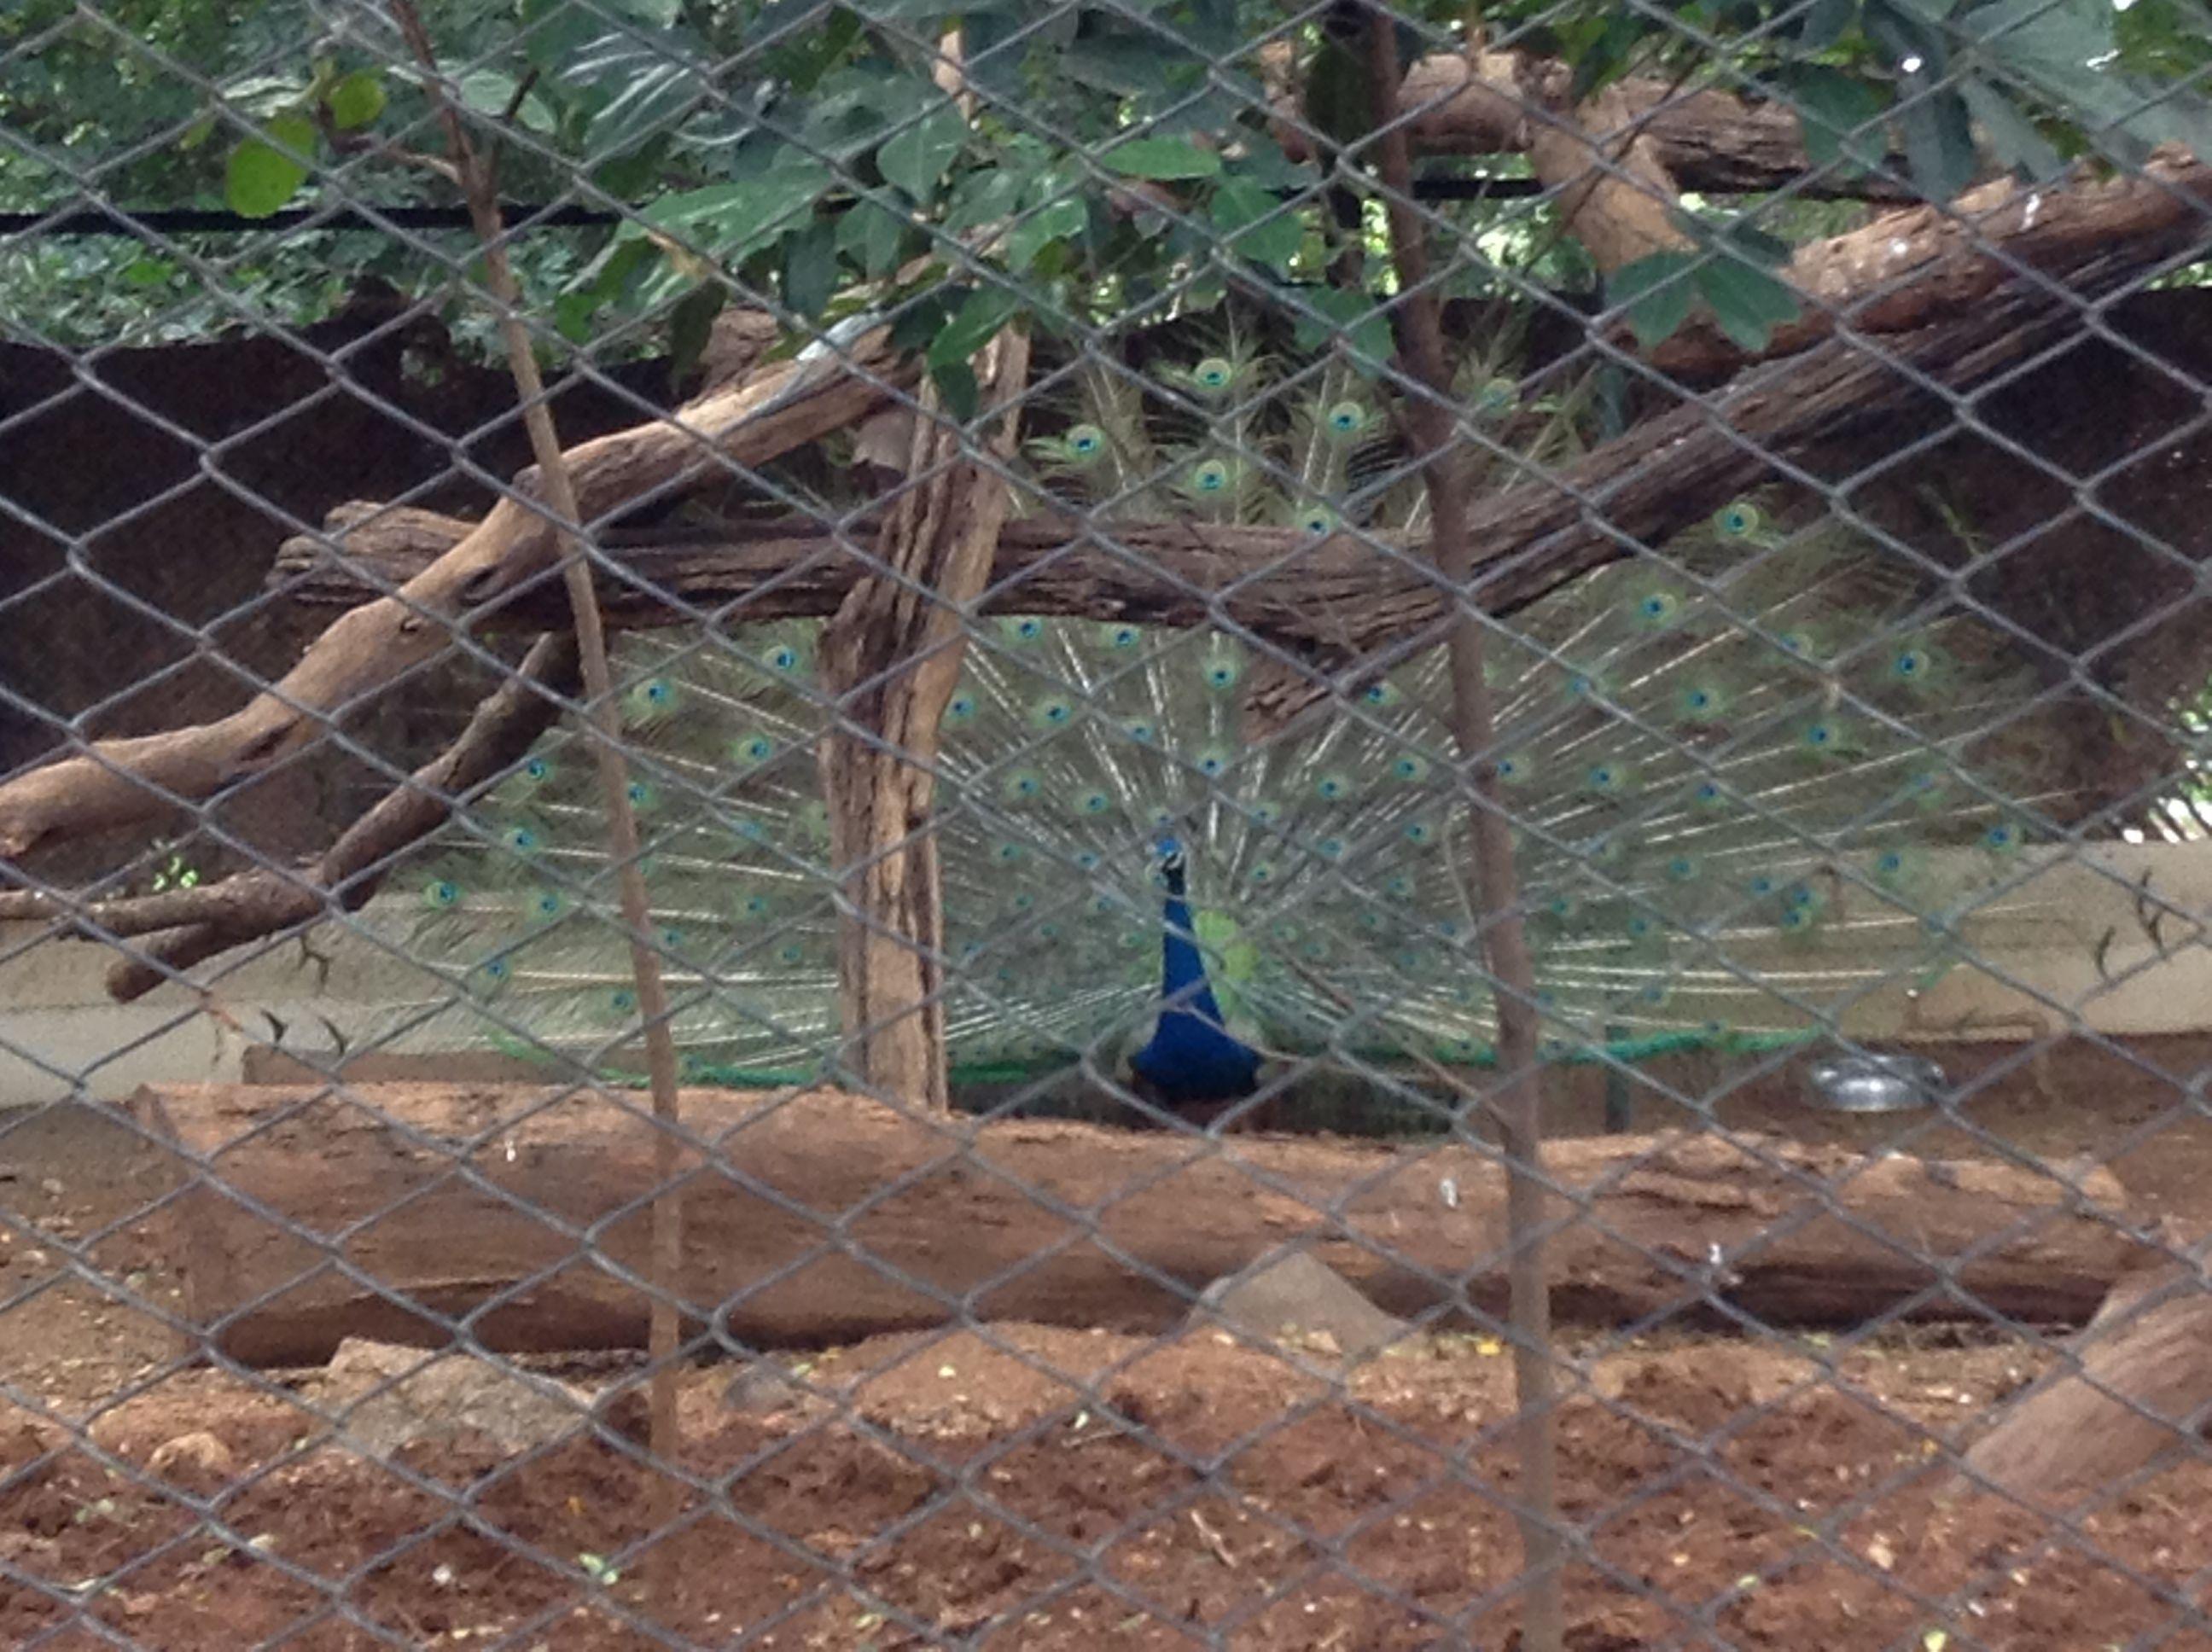 51197e92fb273d64ac785b89a95860a4 - Mysore Zoo Sri Chamarajendra Zoological Gardens